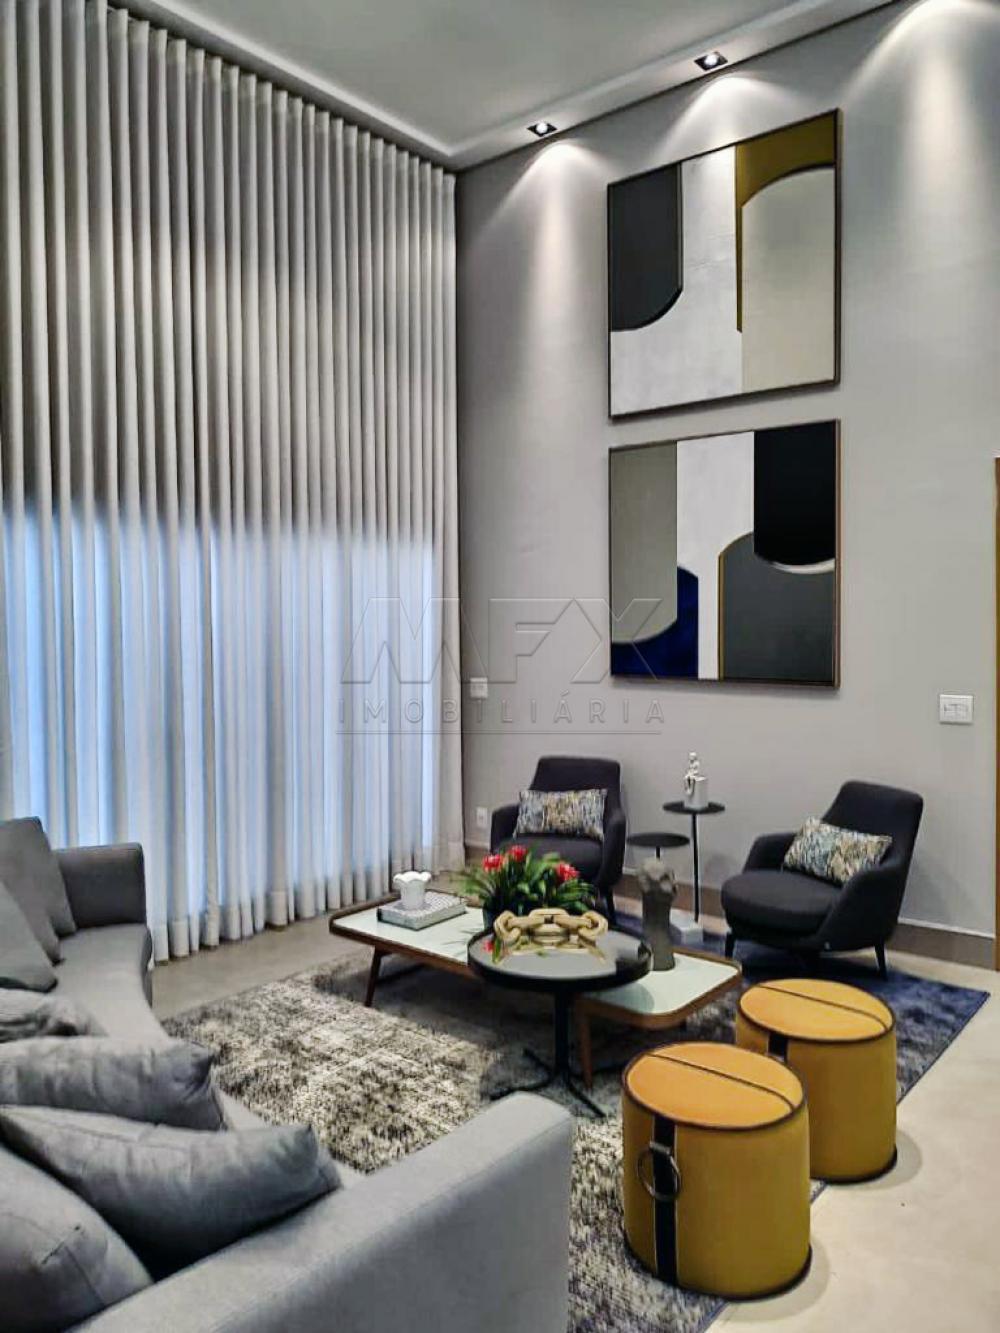 Comprar Casa / Condomínio em Bauru R$ 2.400.000,00 - Foto 9